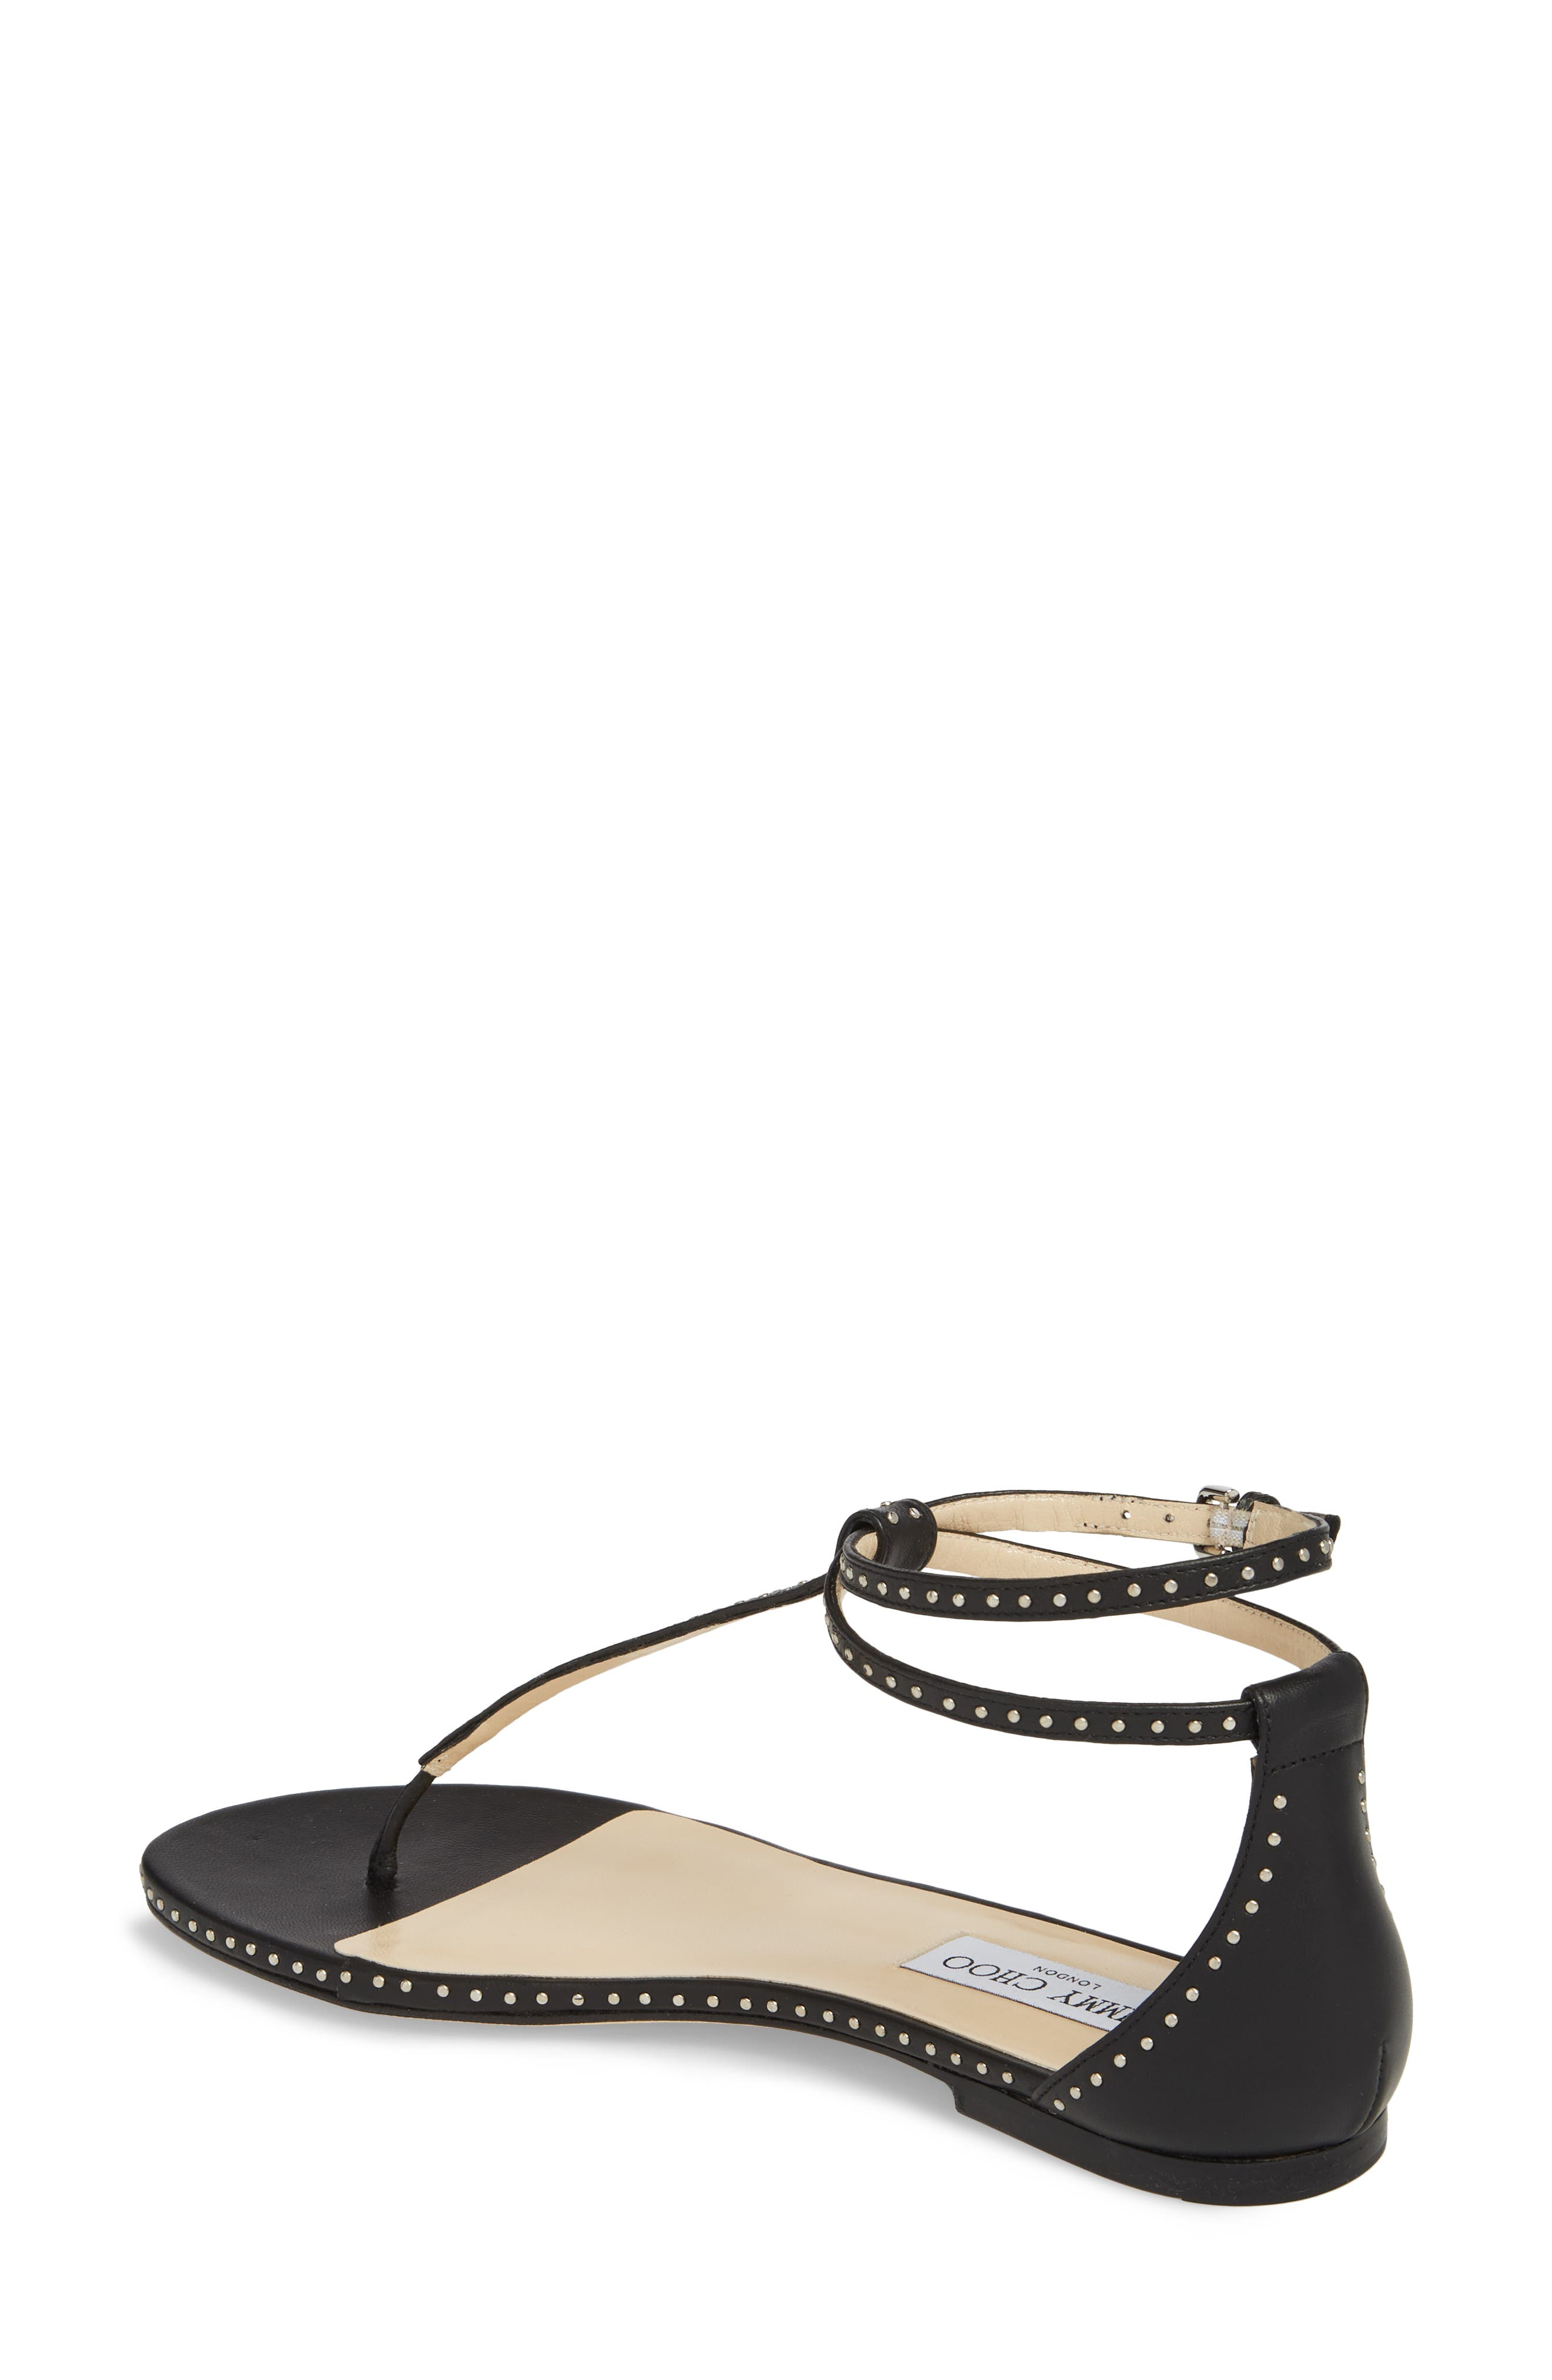 Afia Studded Flat Sandal,                             Alternate thumbnail 2, color,                             BLACK